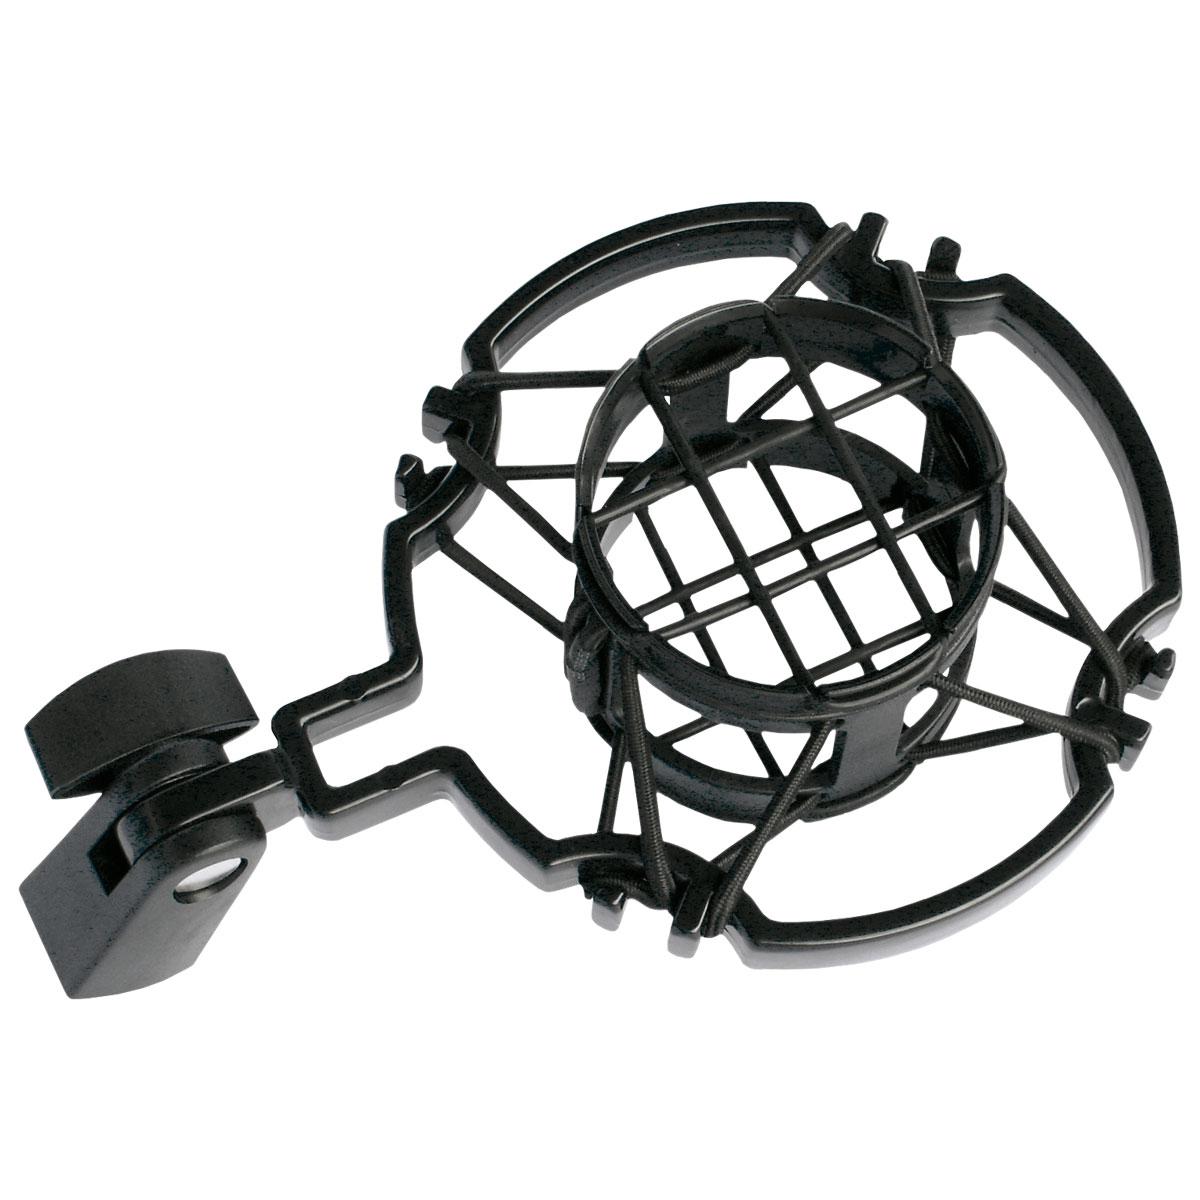 Suporte Antiestático p/ Microfone - SHM 2 CSR